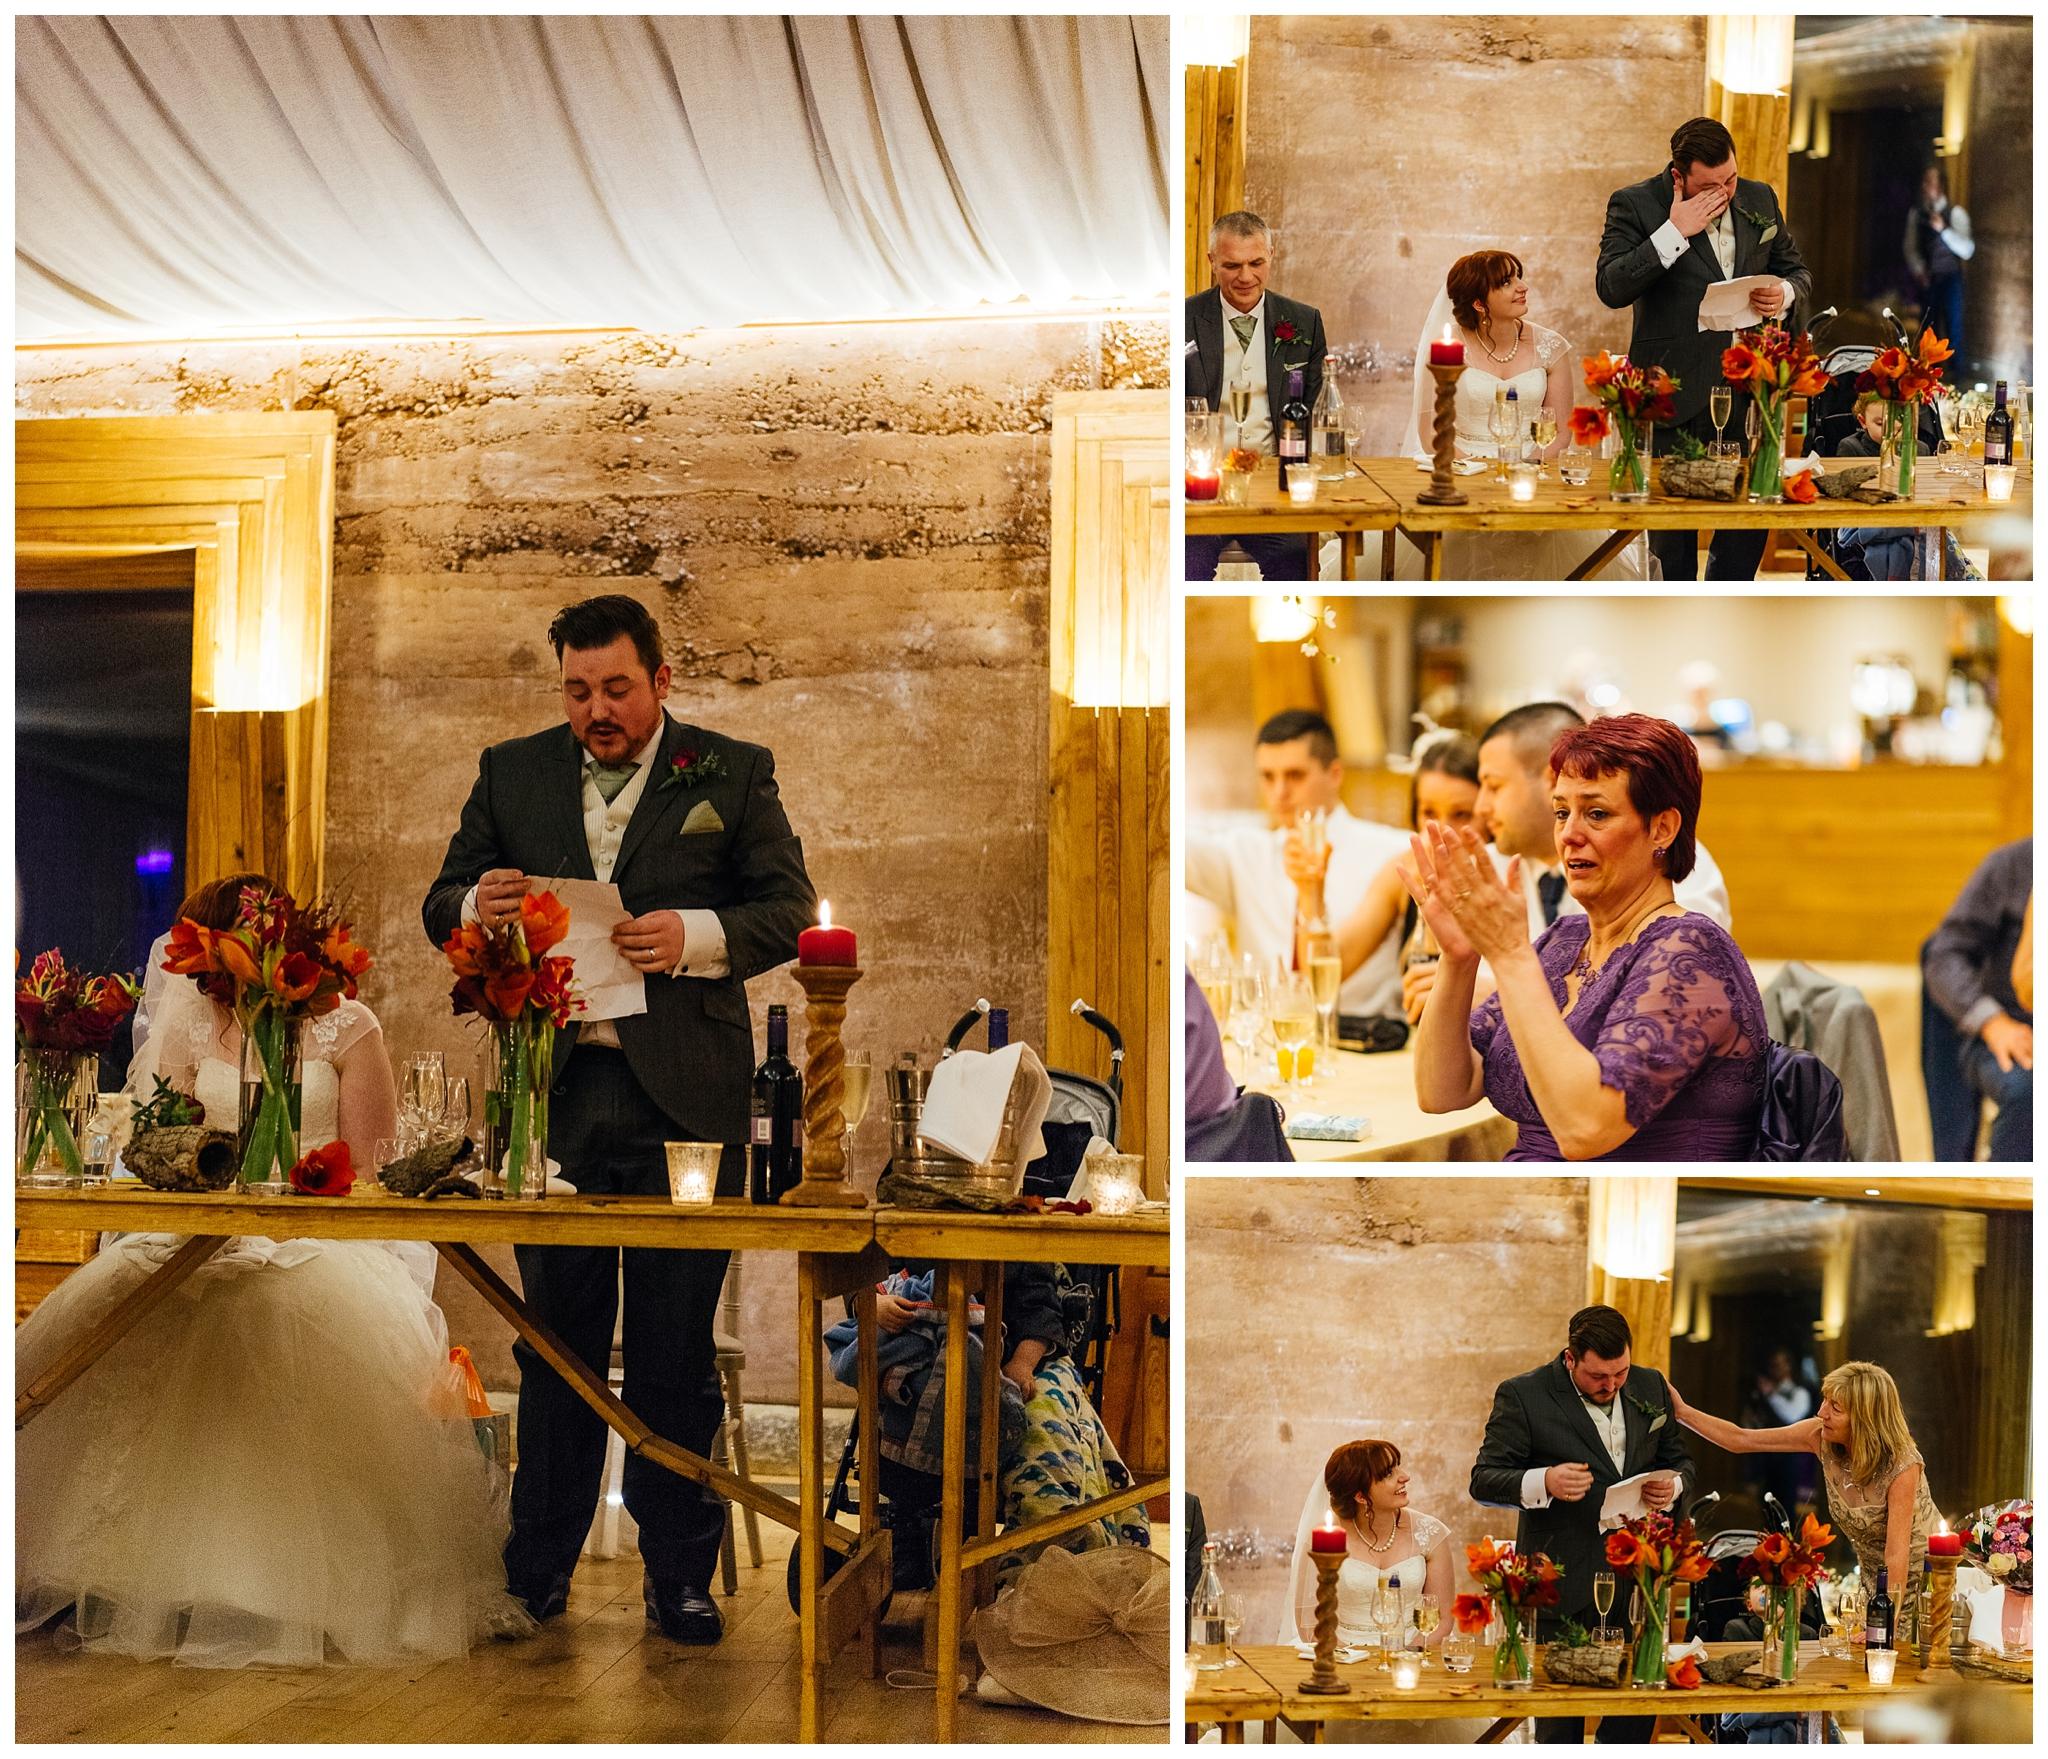 Emma&Paul-Elmore-Court-Winter-Wedding-Nikki-Cooper-Photography_0095.jpg